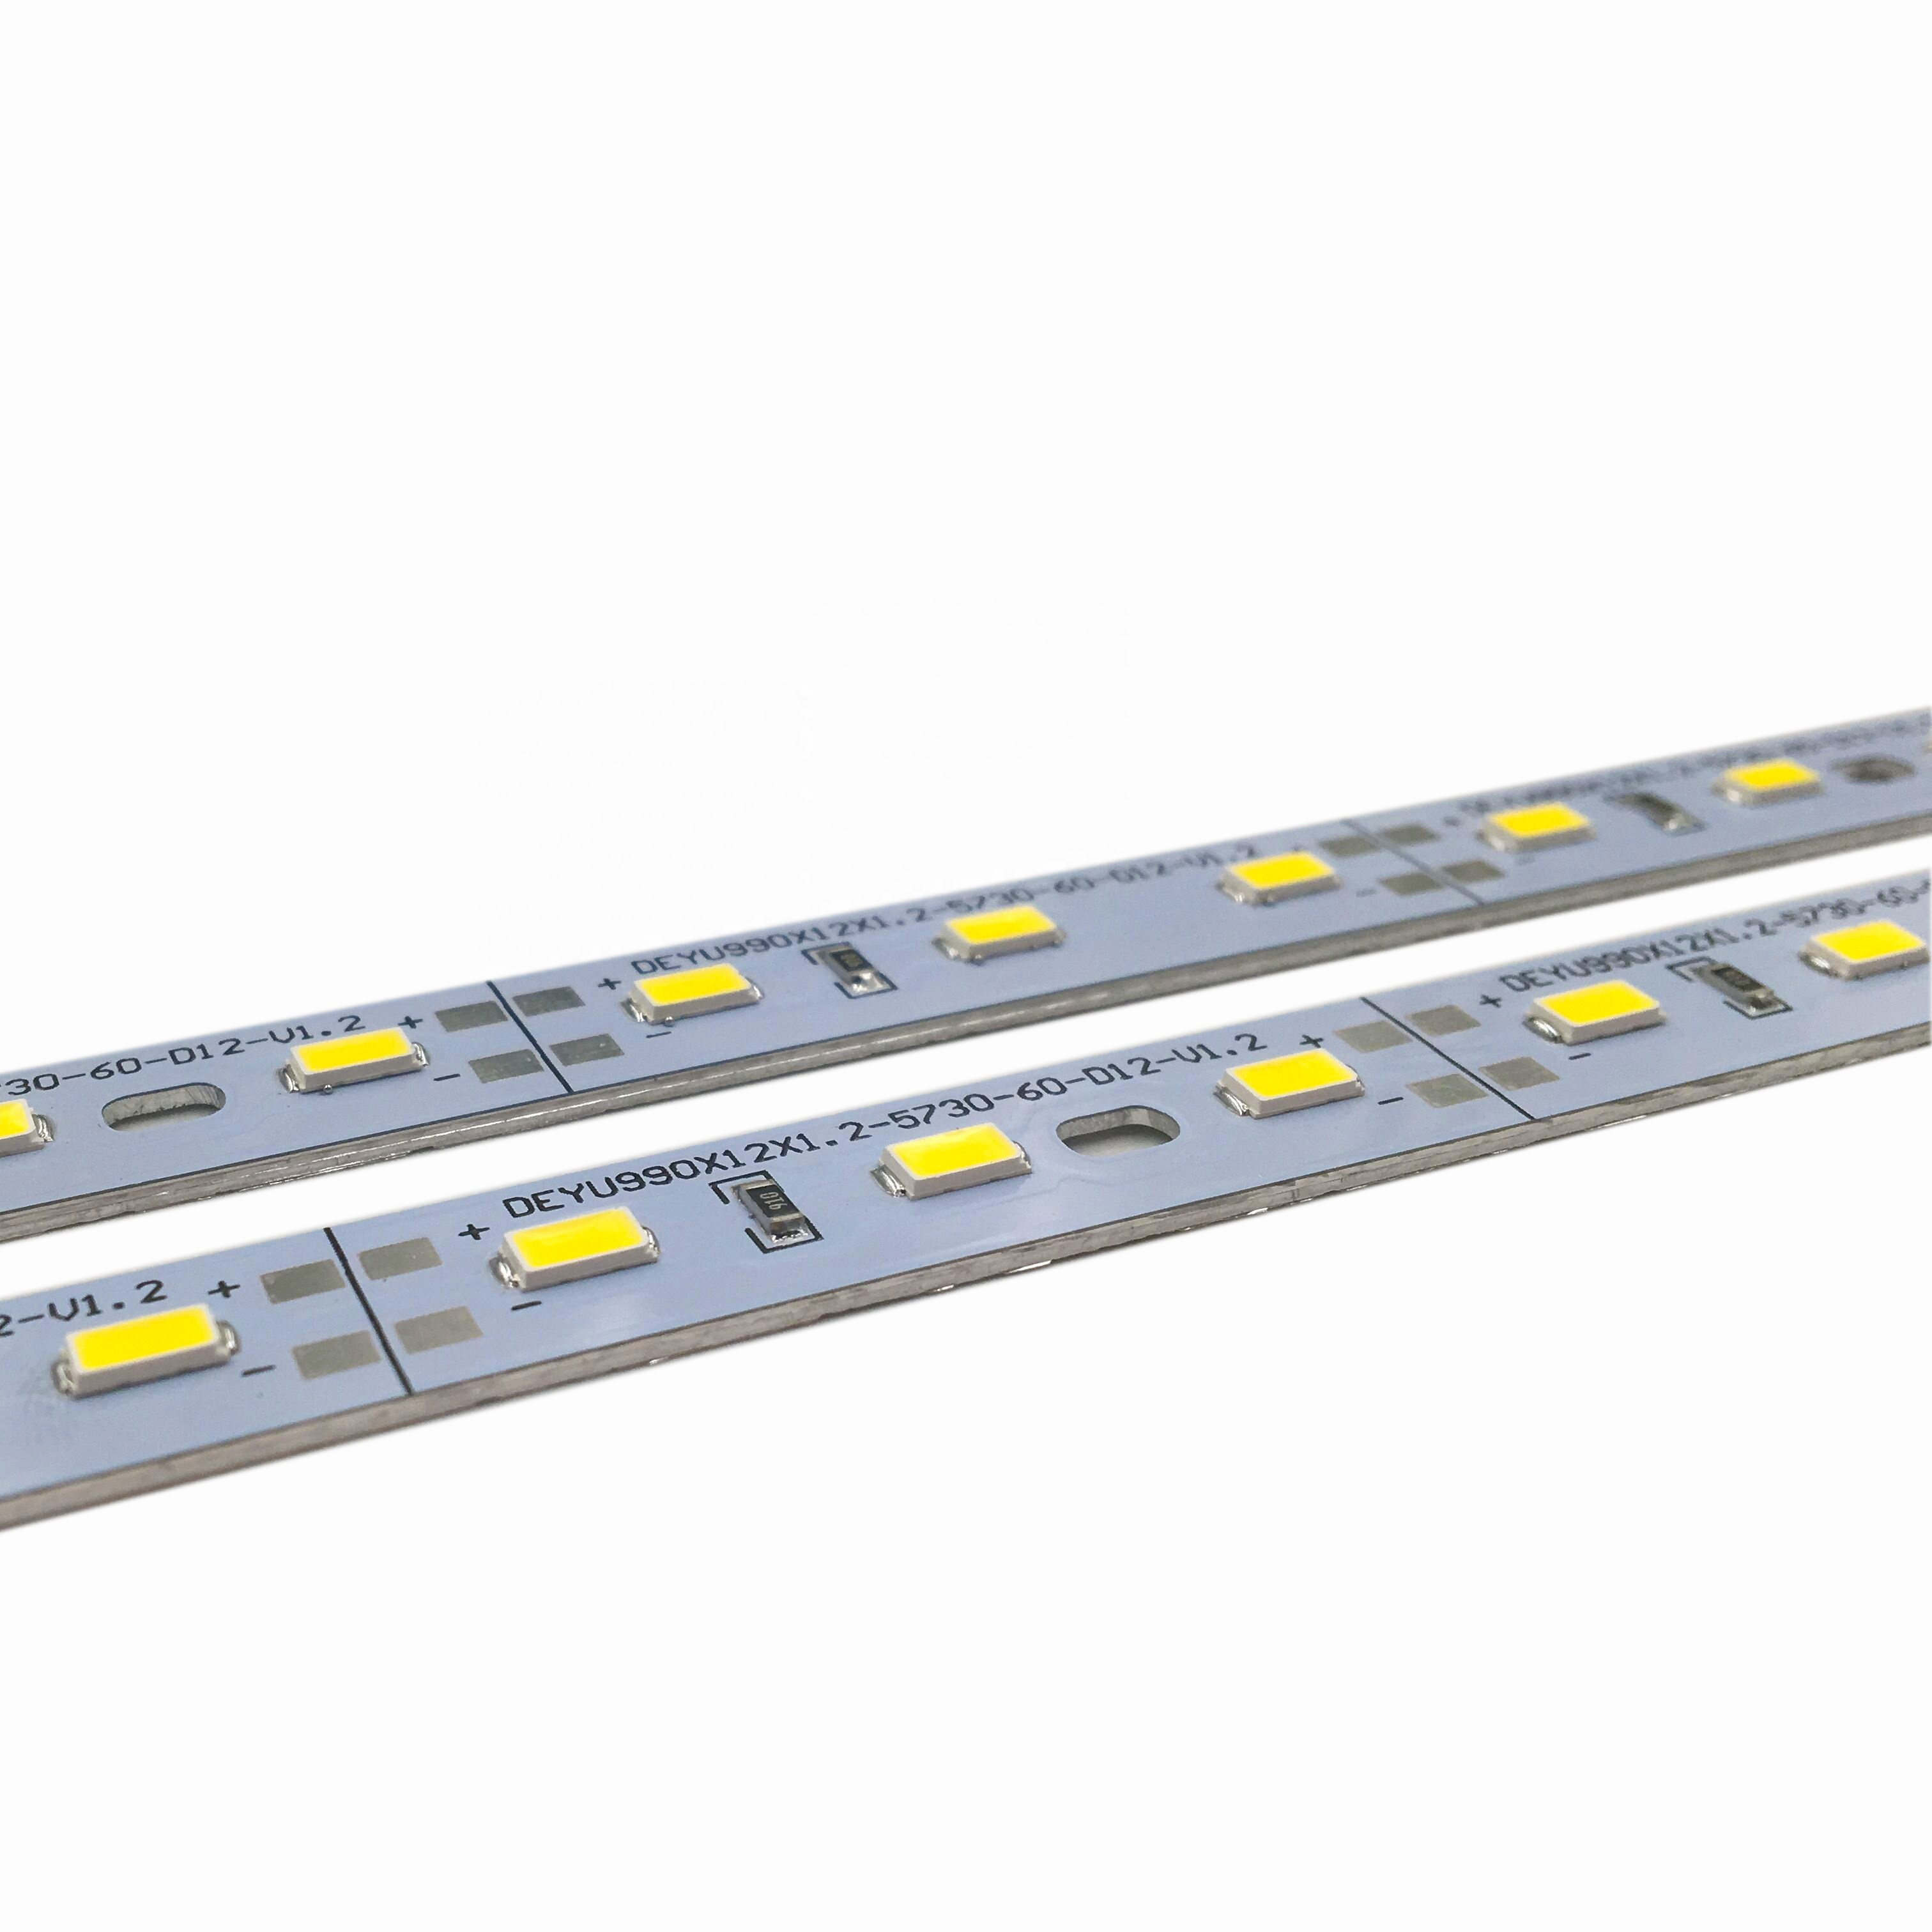 China led manufacturer wholesale smd 5730 high brightness led fixture strip lights